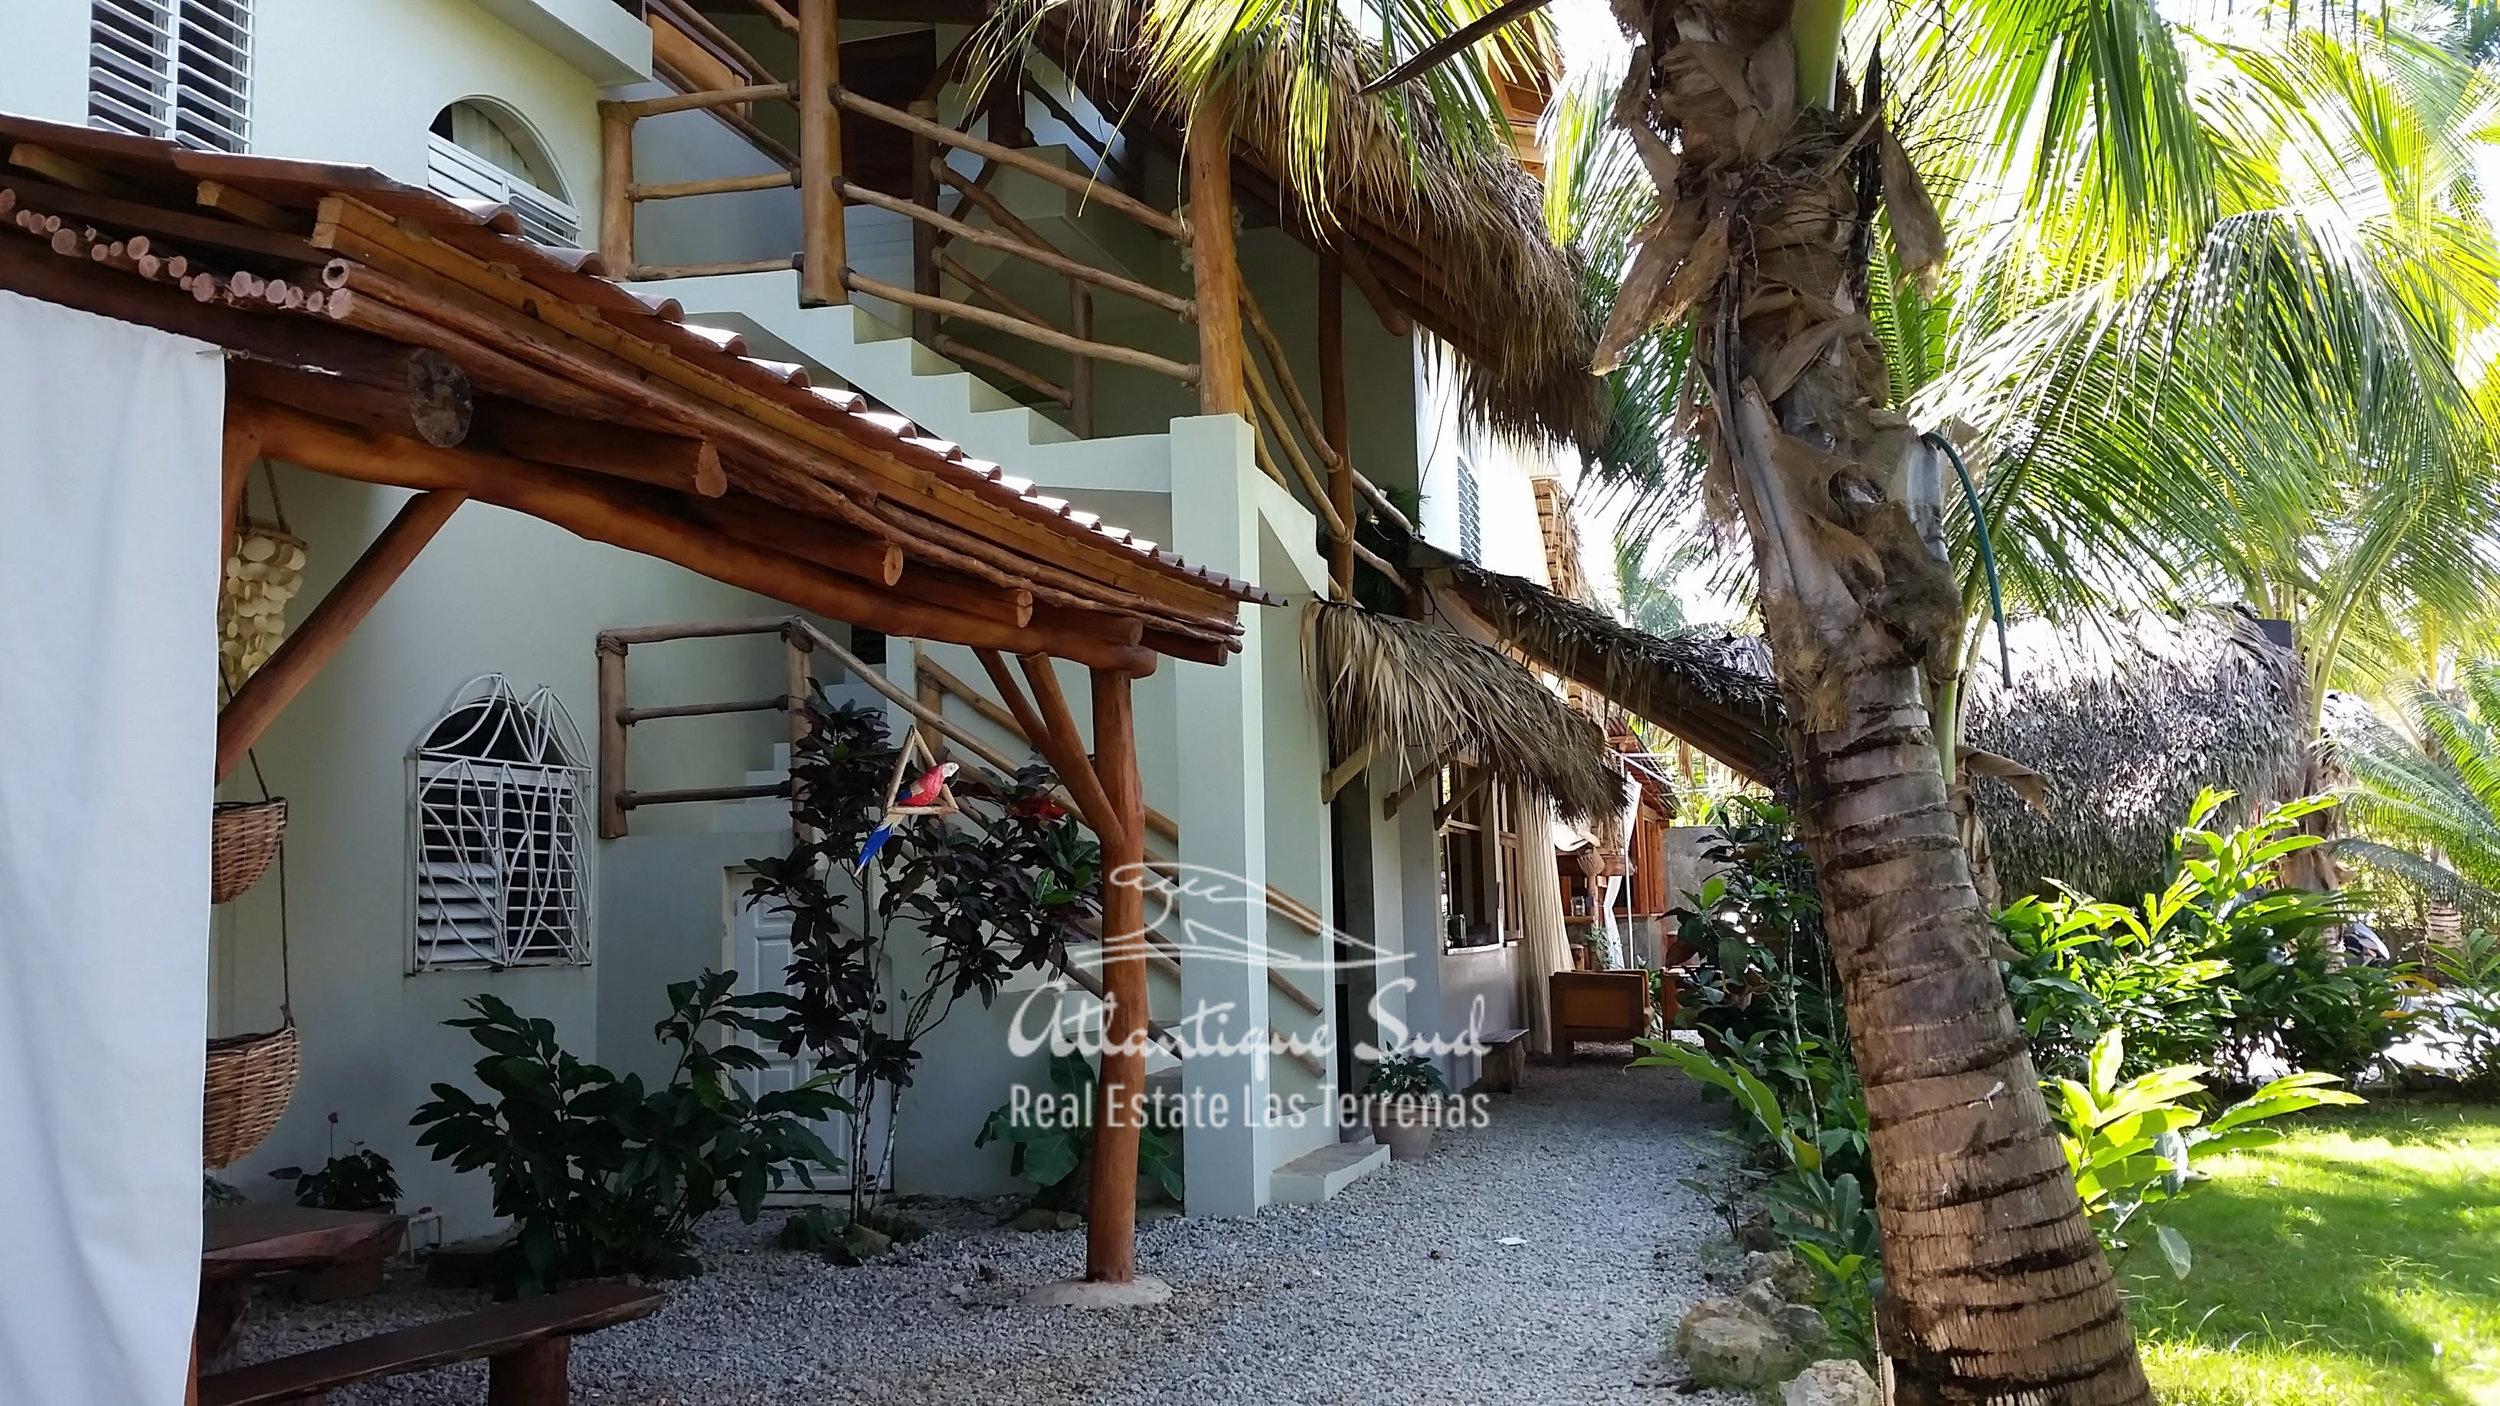 Typical caribbean hotel for sale Real Estate Las Terrenas Dominican Republic Atlantique Sud29.jpg